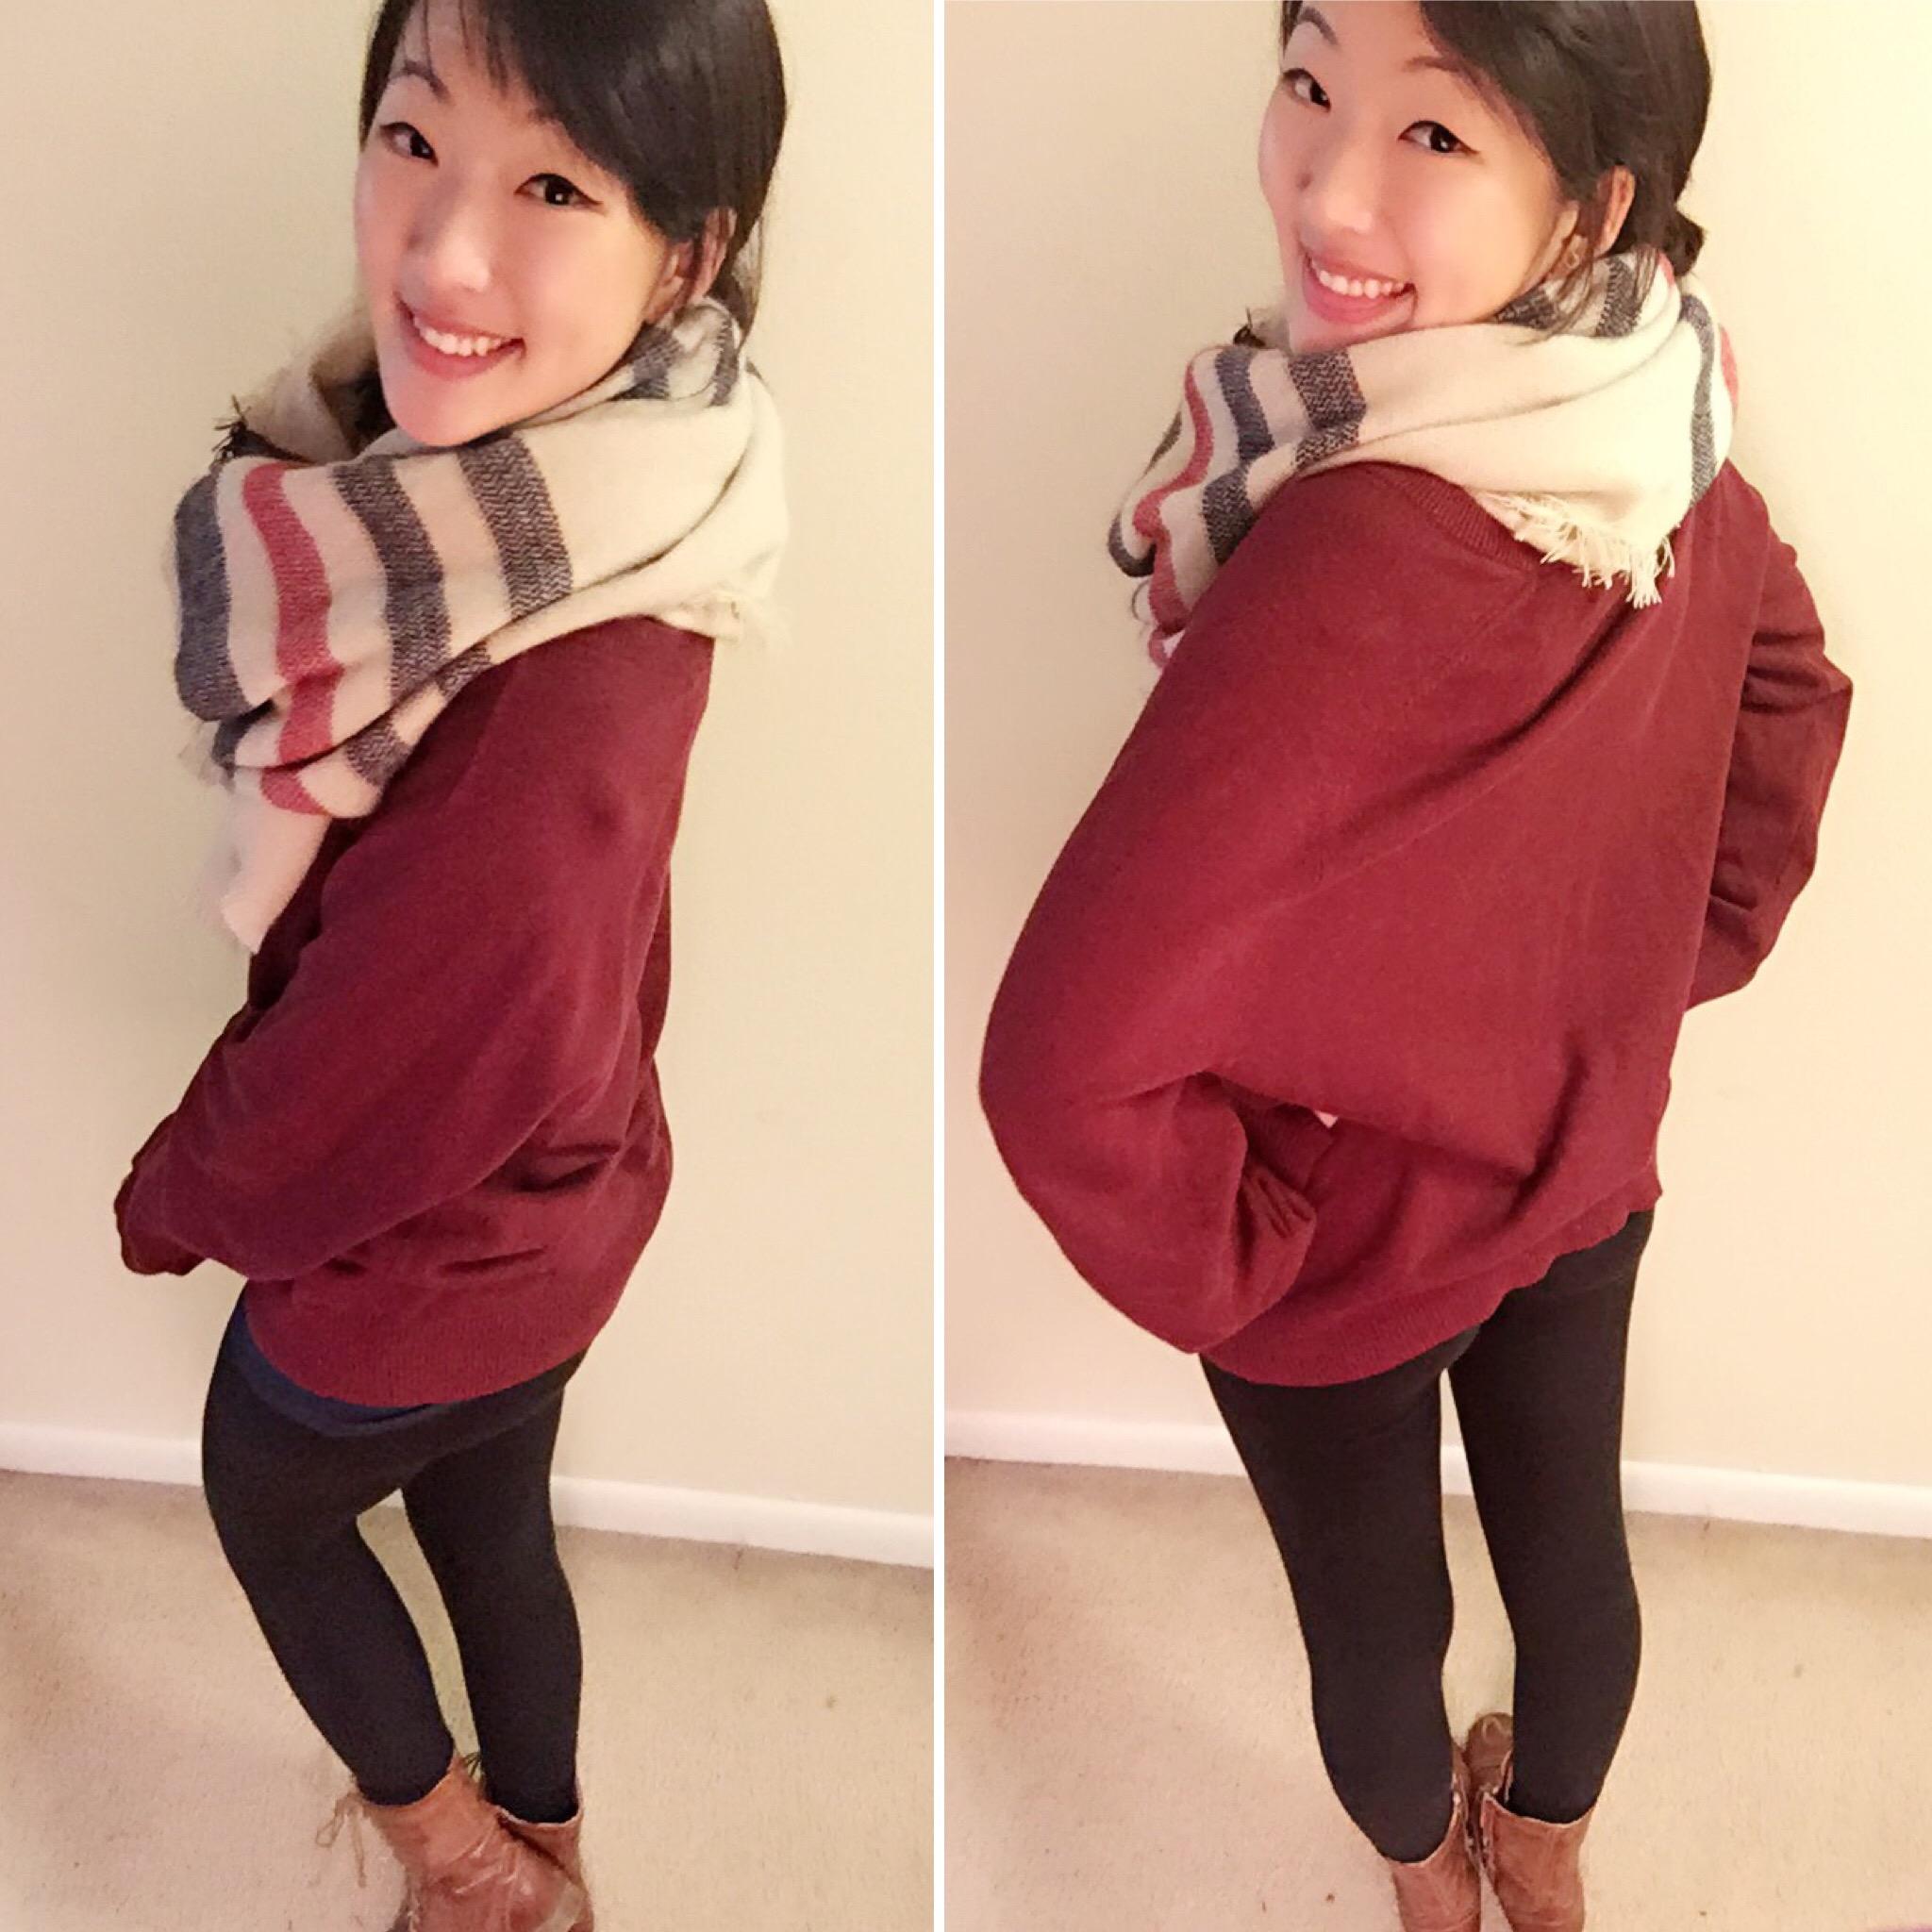 Sweater: Old Navy (Men's)/Scarf: Francesca's/Leggings: Victoria's Secret/Boots: Zappo's/Earrings: Target